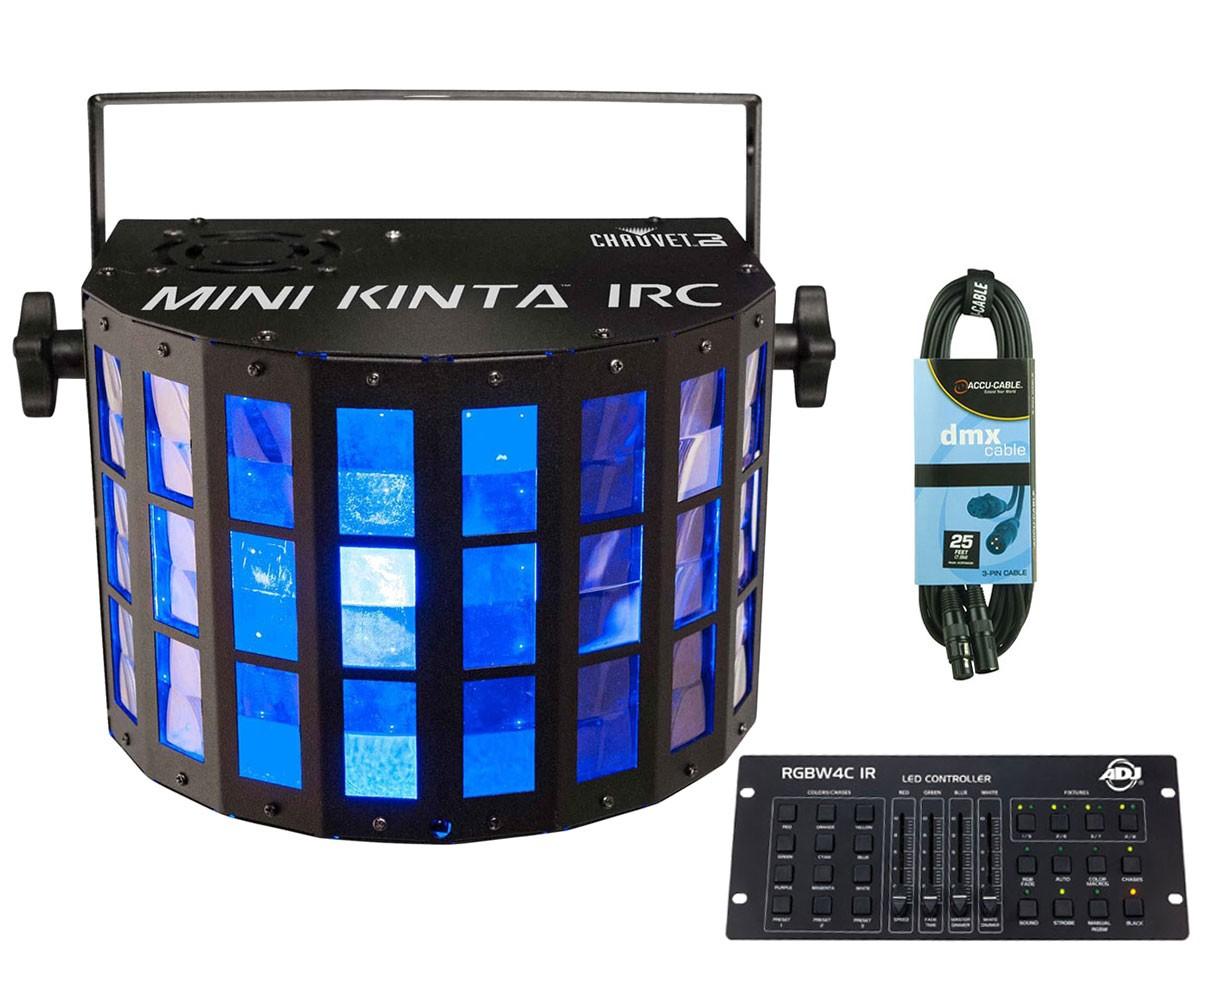 CHAUVET DJ Mini Kinta IRC + RGBW4C IR + Cable